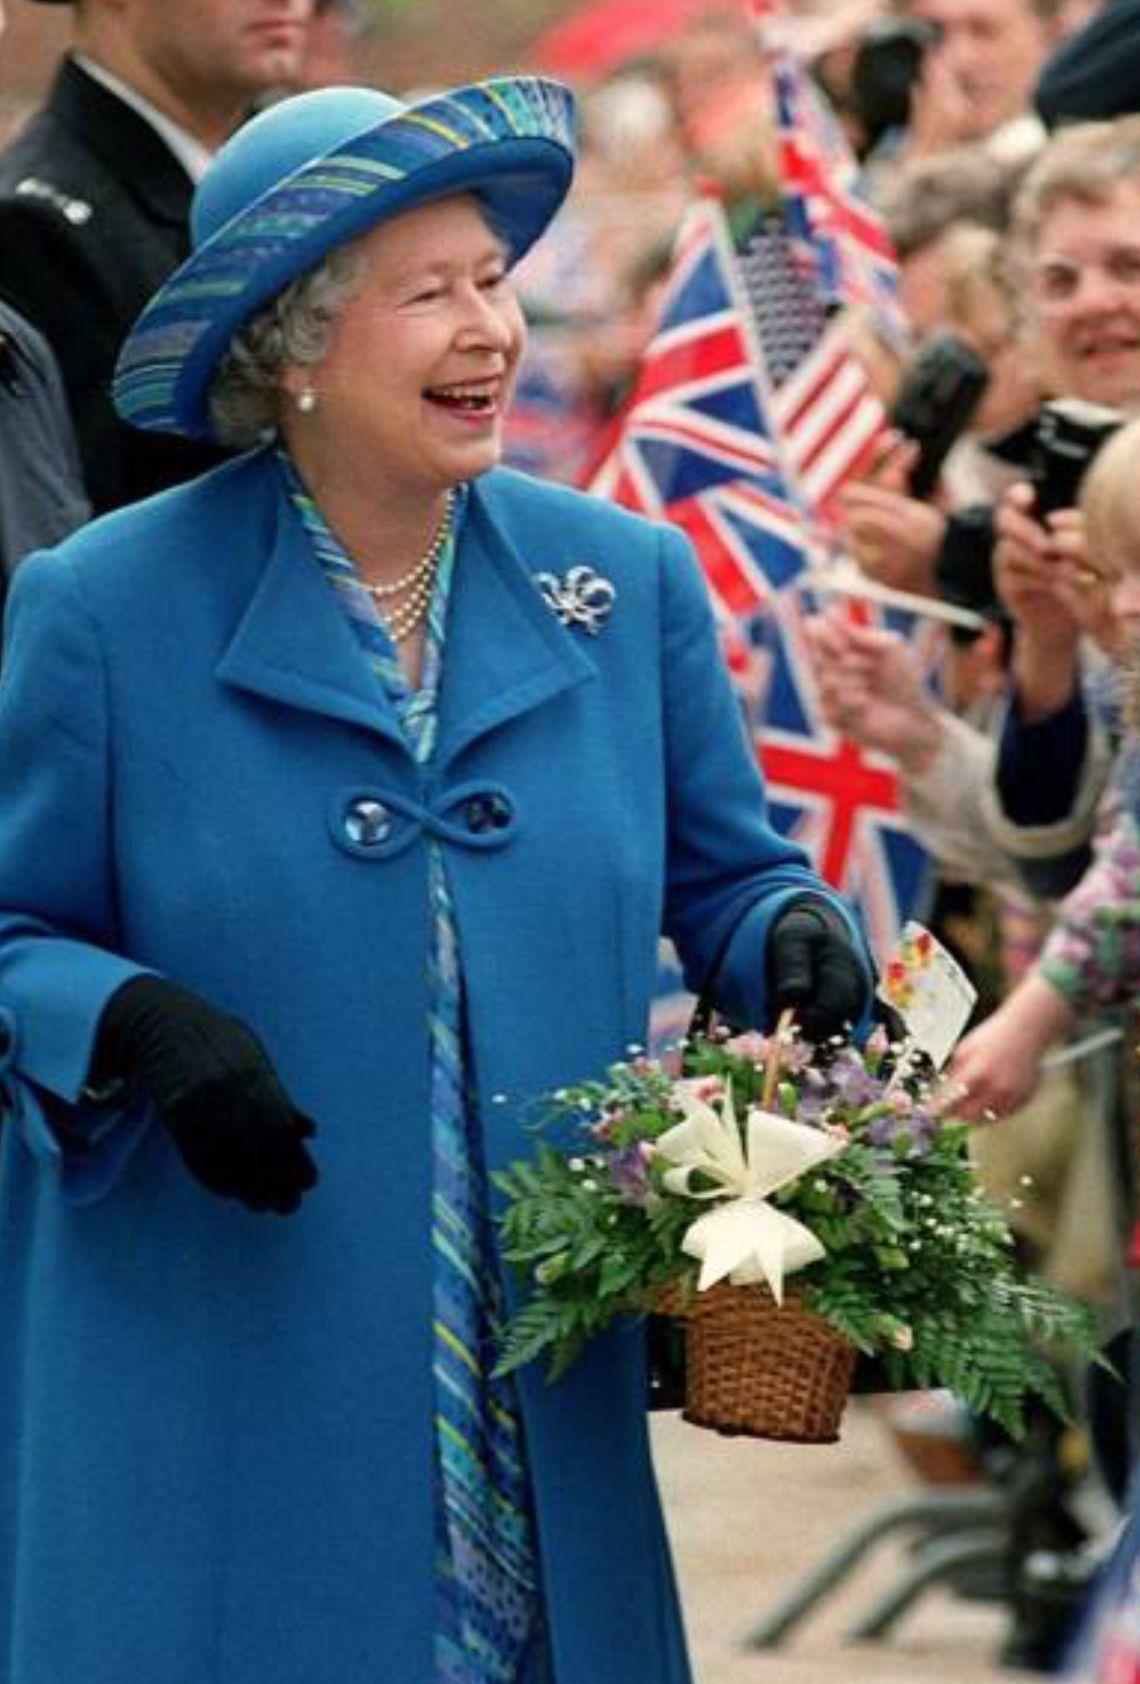 November 1997. 50th wedding anniversary. Queen Elizabeth